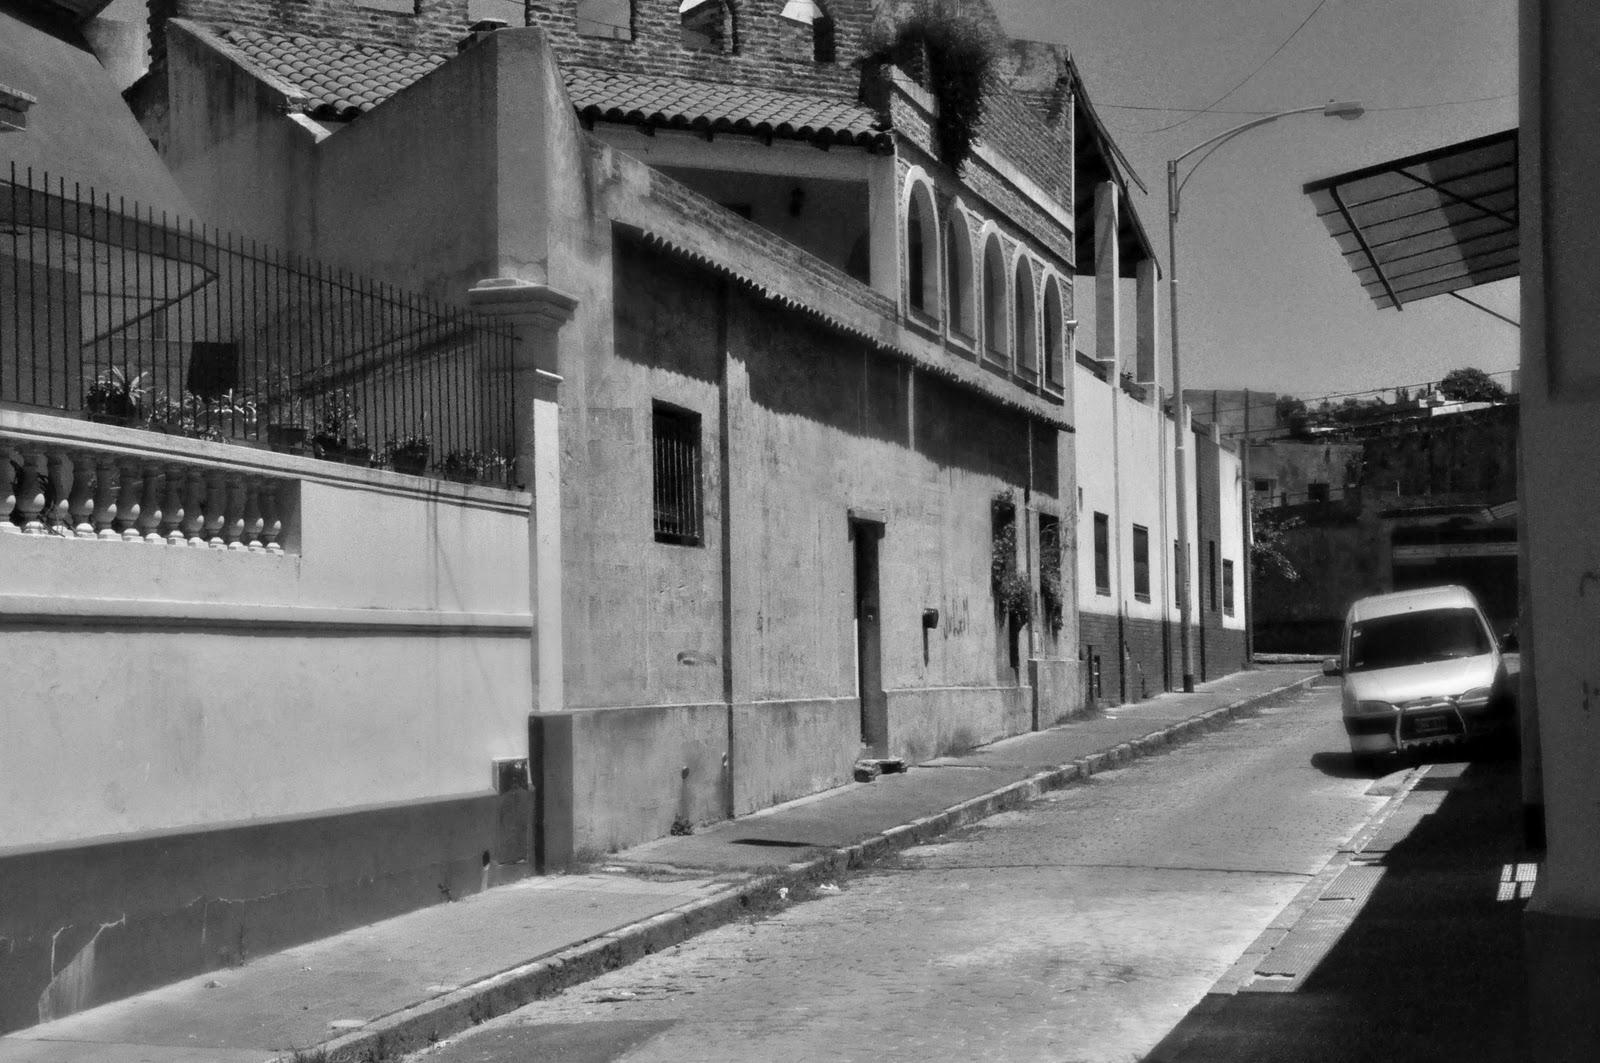 Micaela del barrio 22 de abril tirando goma - 3 6